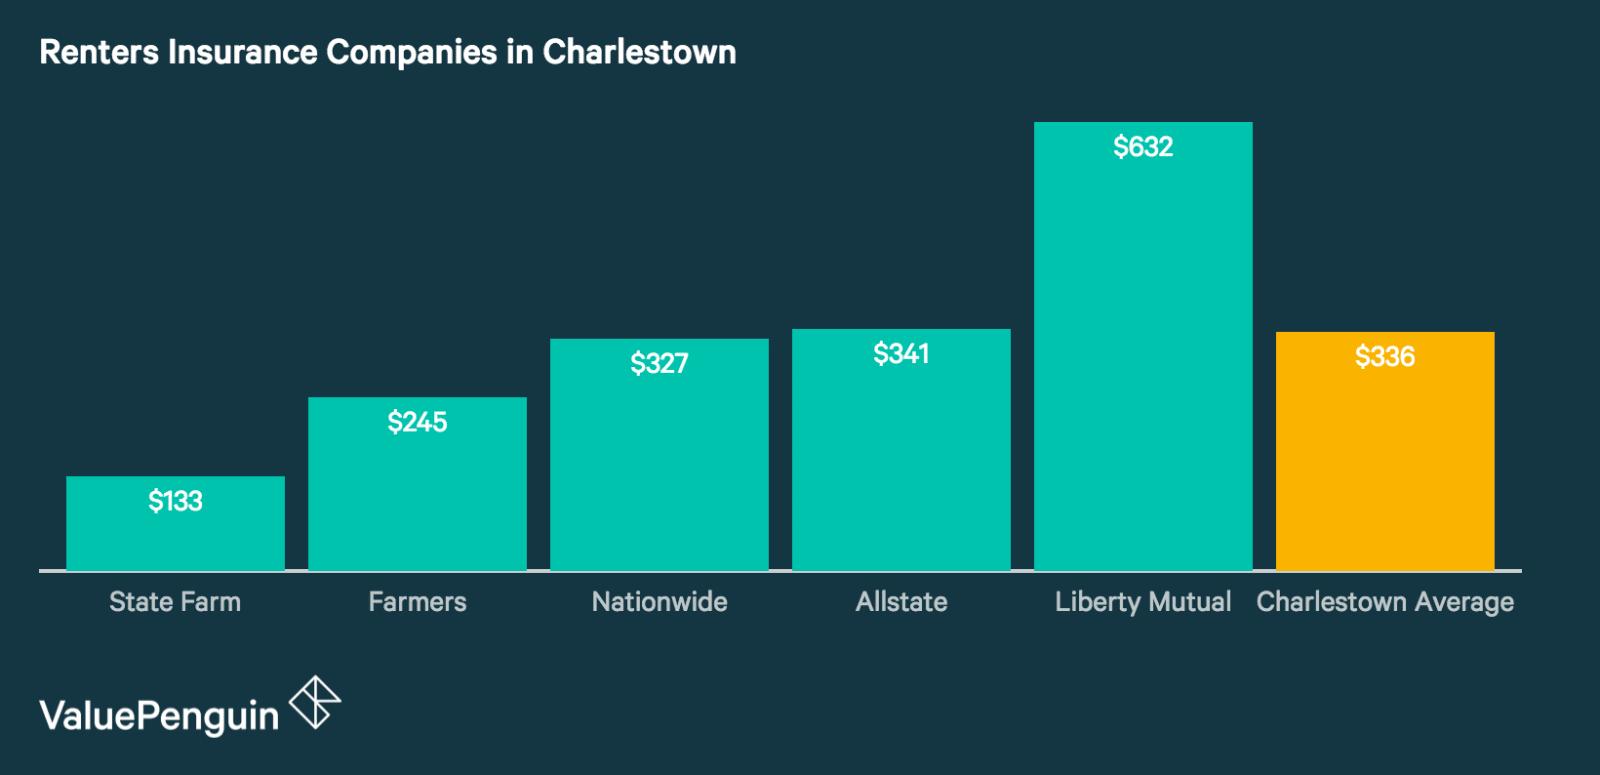 Charlestown's Best Renters Insurance Companies